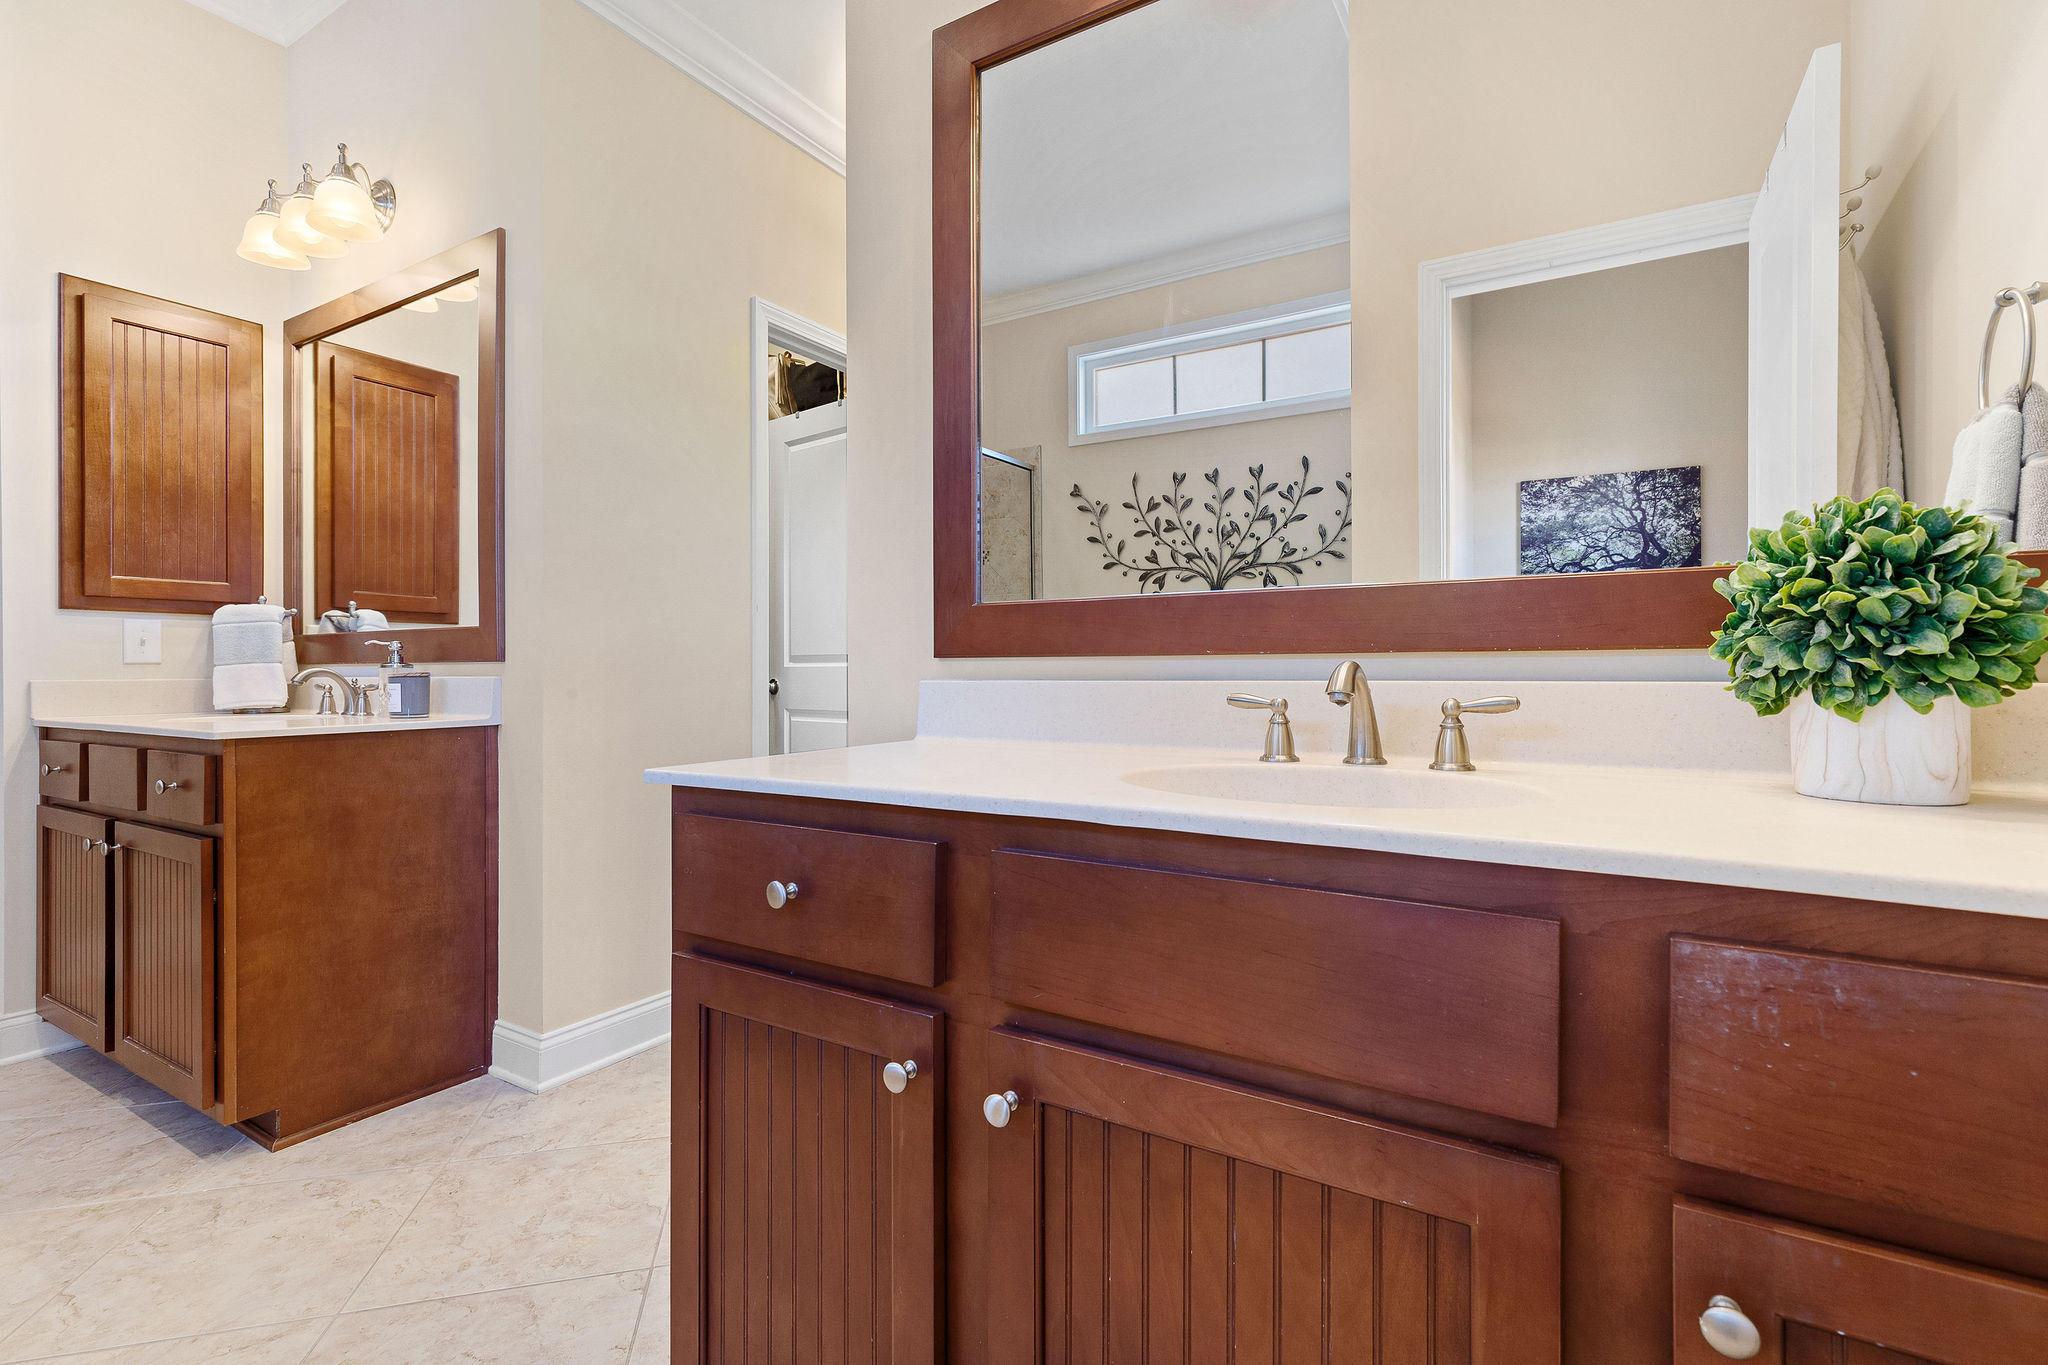 Dunes West Homes For Sale - 3212 Hatchway, Mount Pleasant, SC - 9